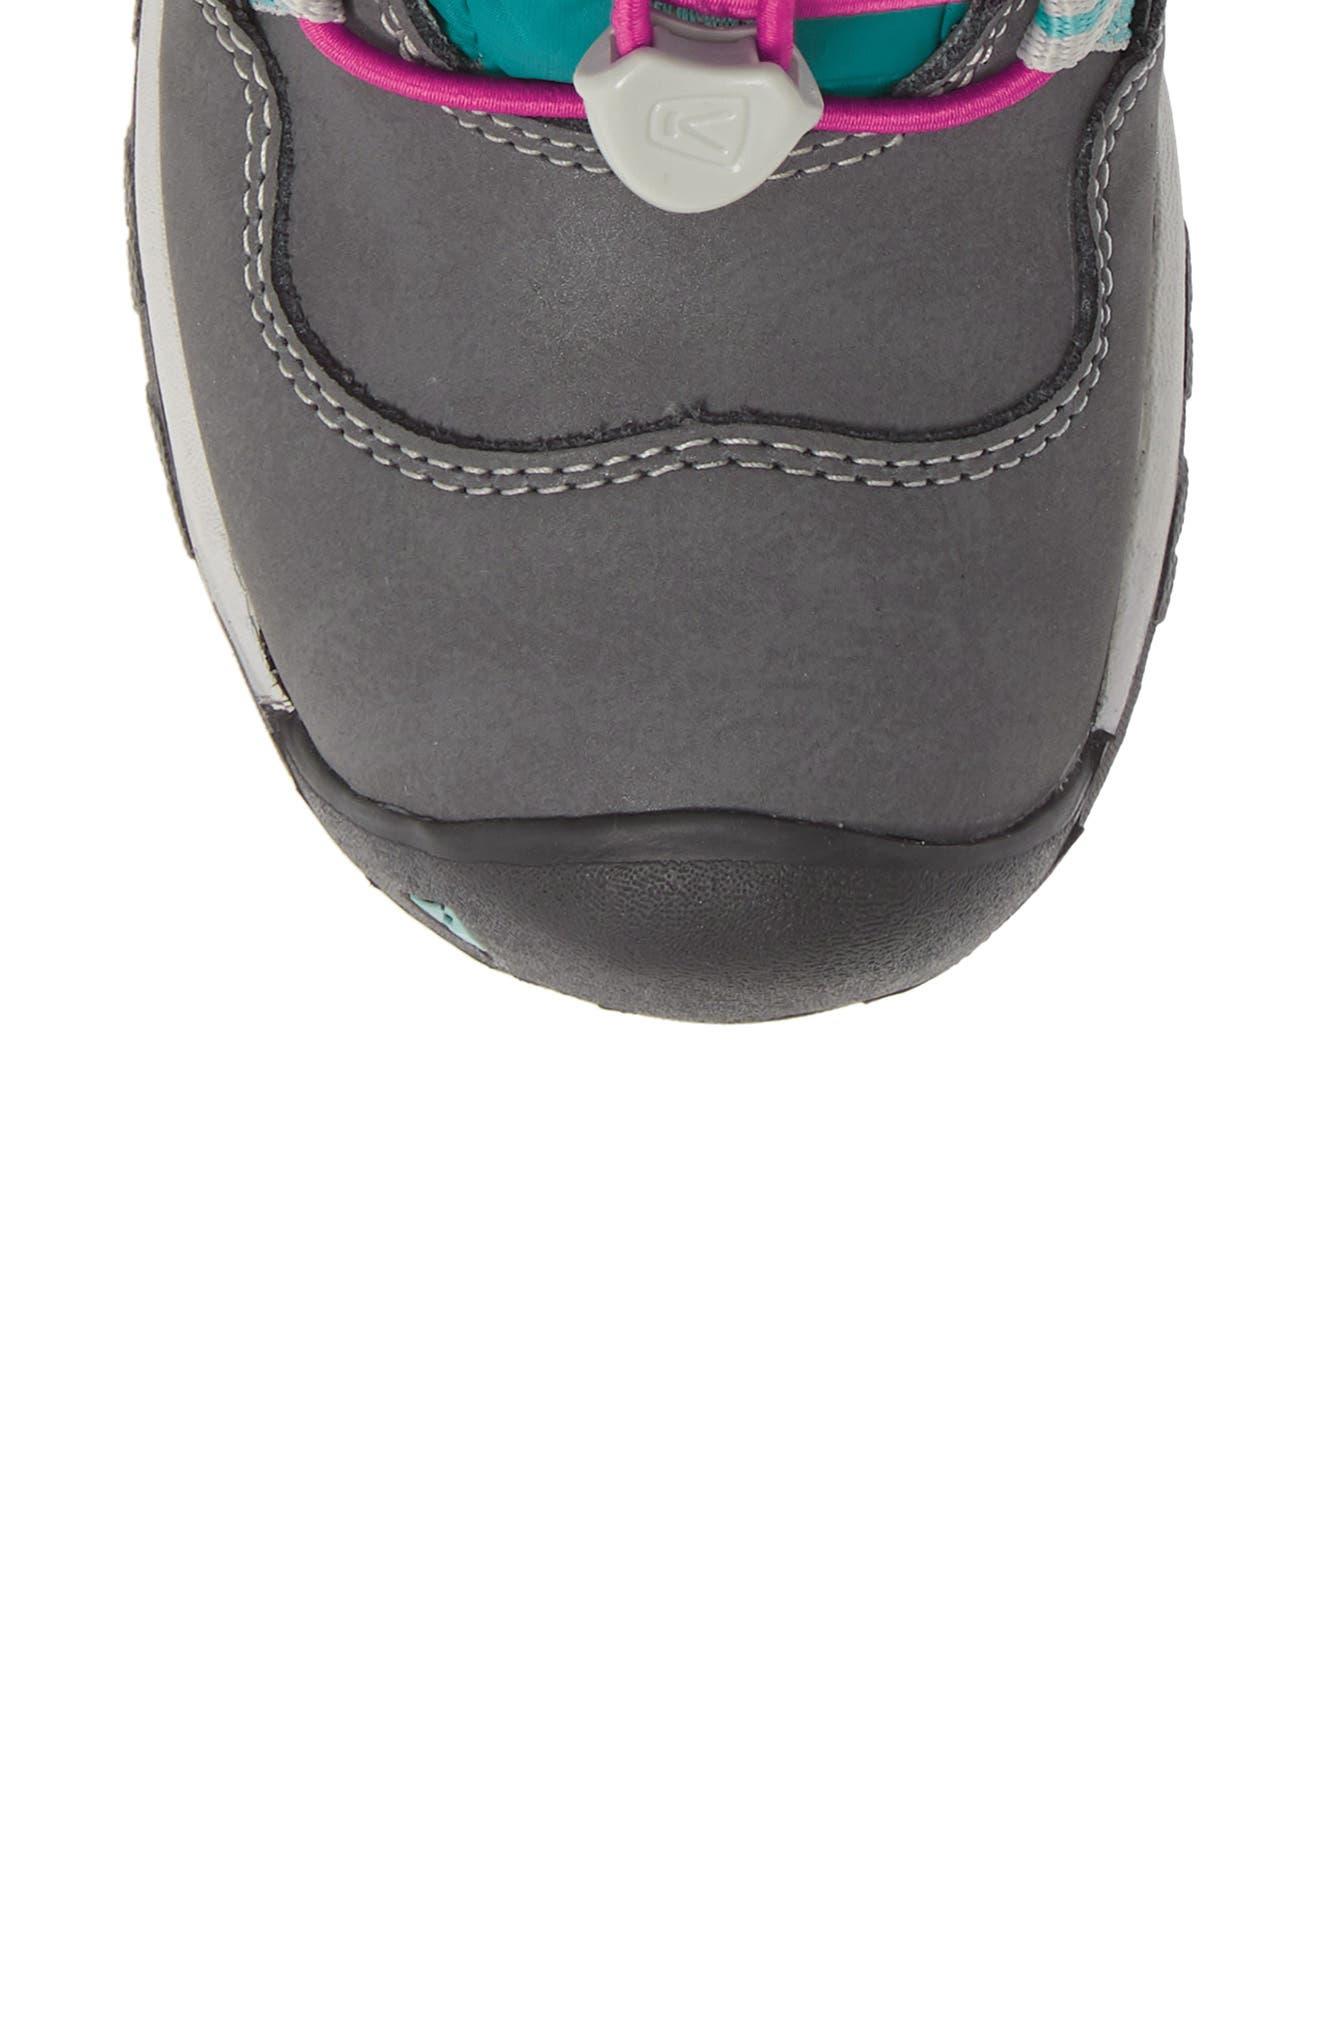 KEEN, Hoodoo Waterproof Insulated Boot, Alternate thumbnail 5, color, STEEL GREY/ CABARET